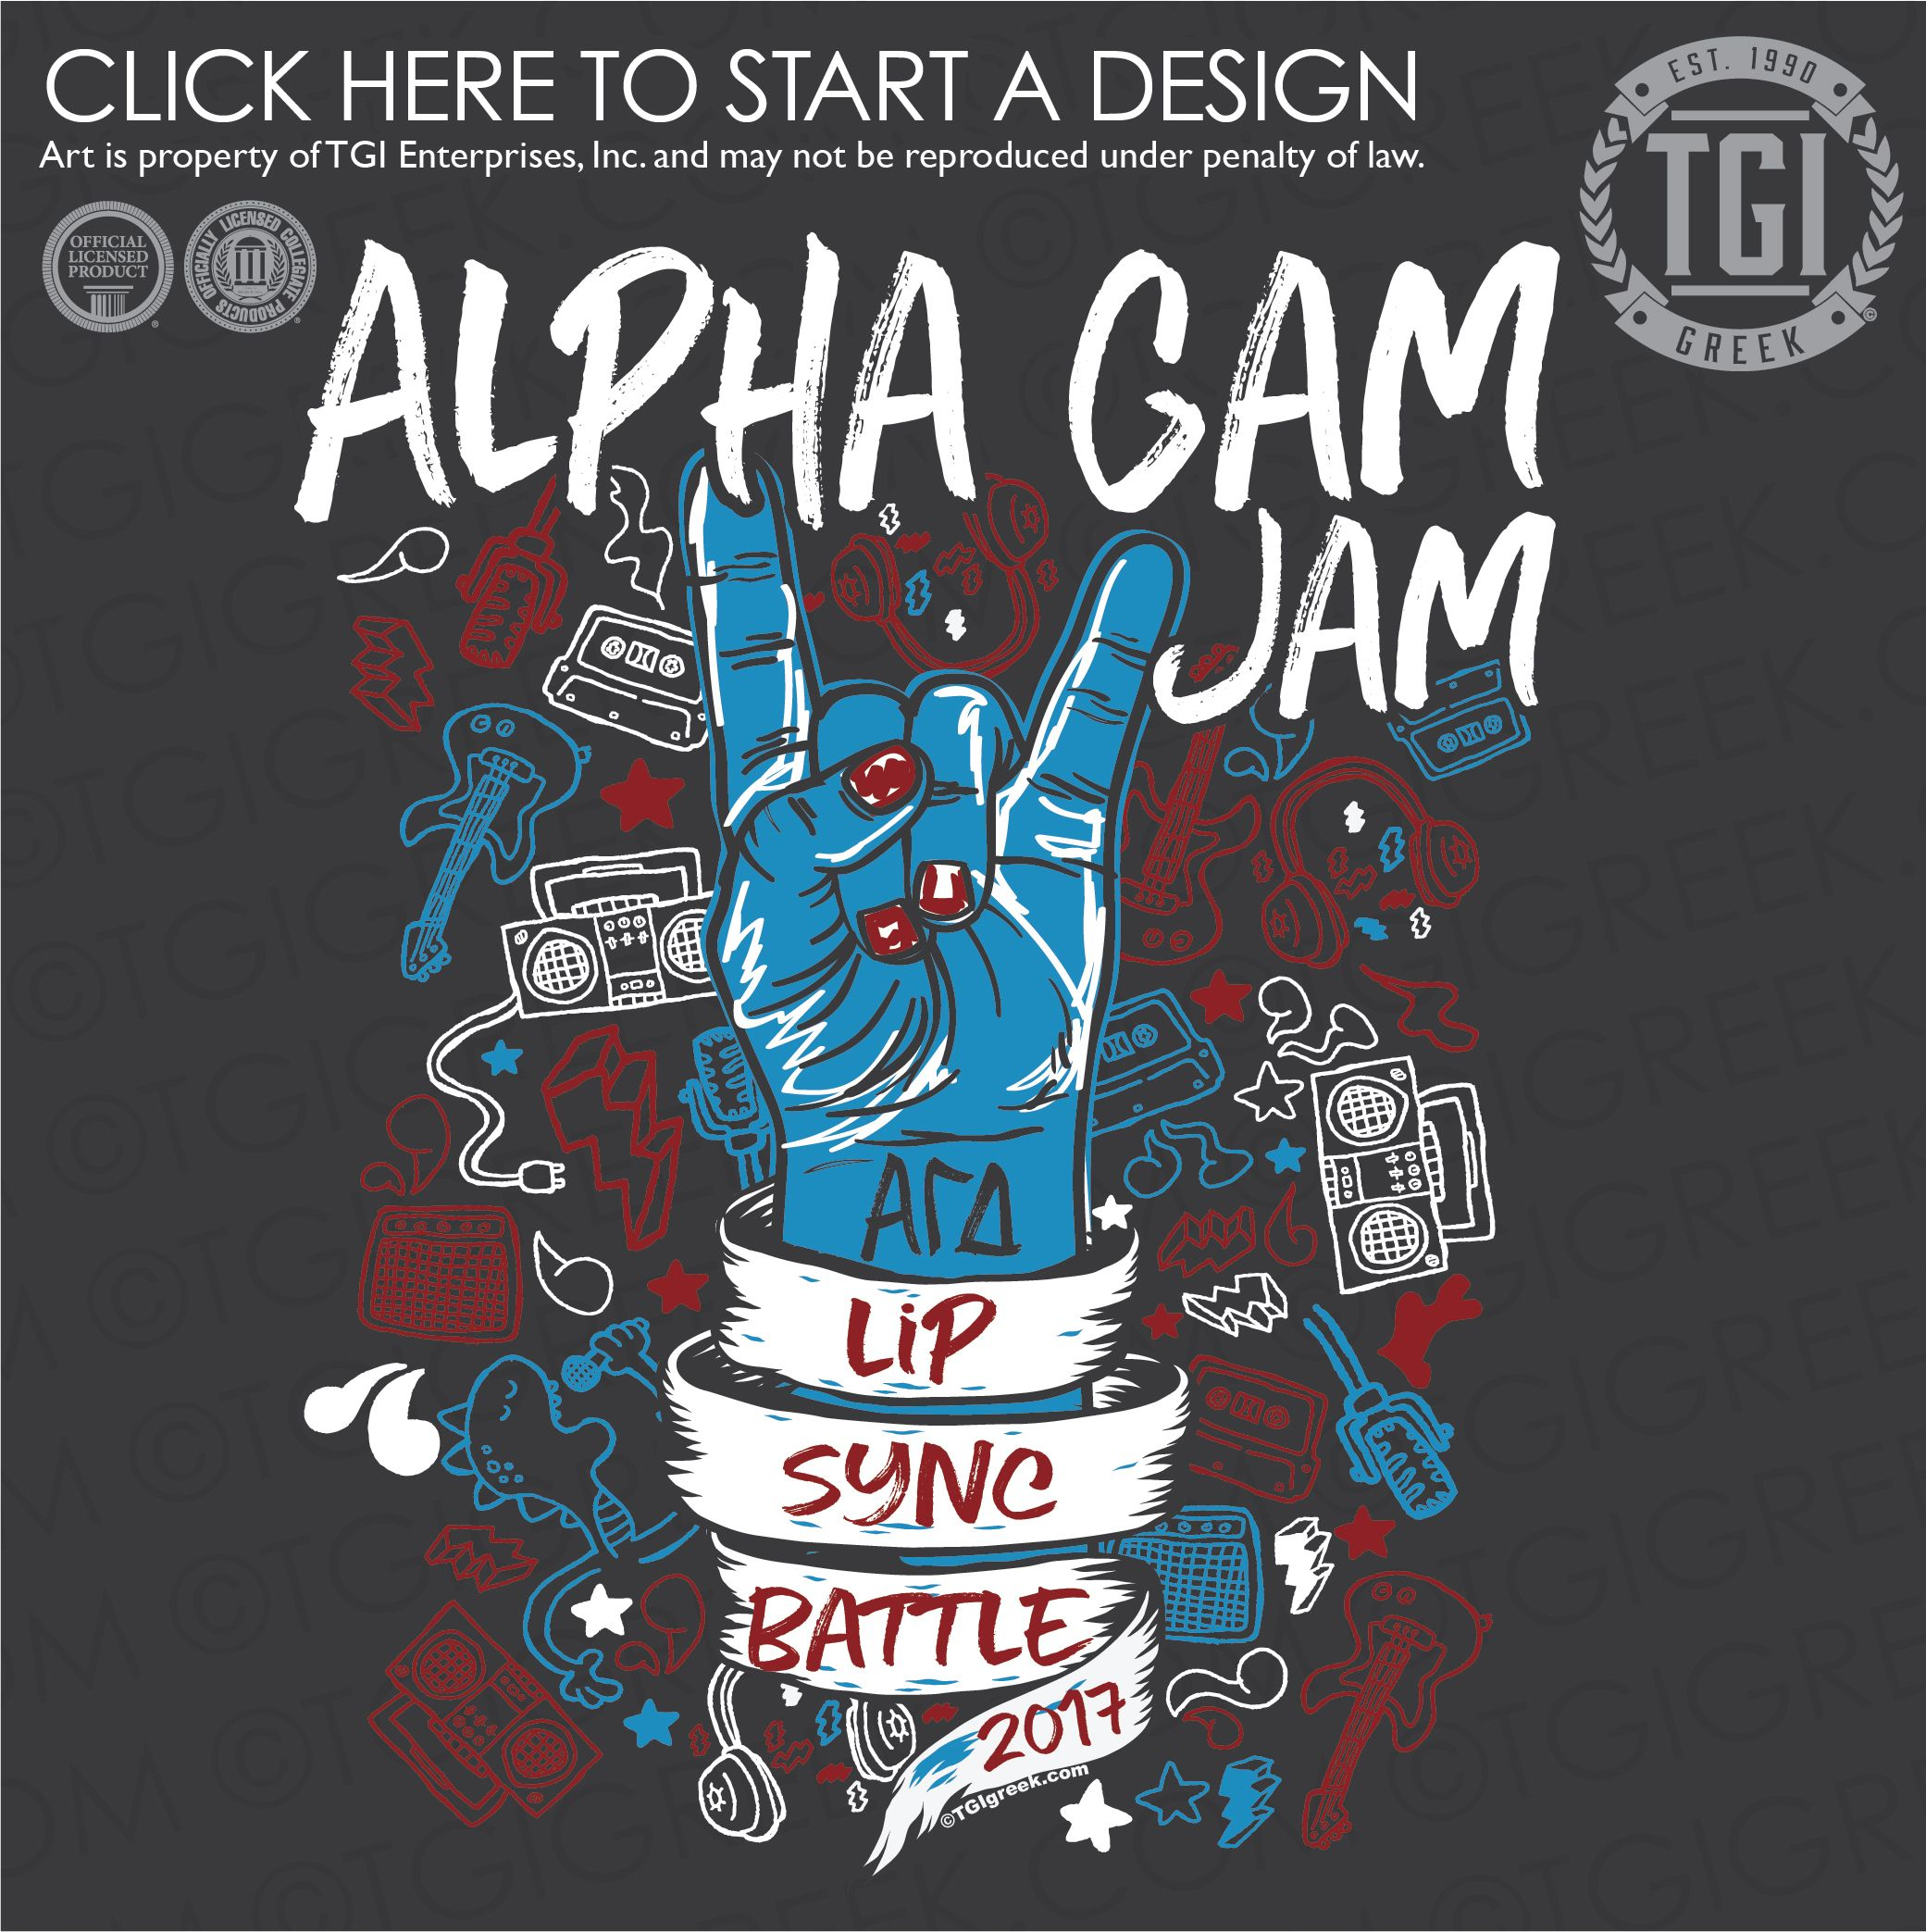 Alpha Gamma Delta αγδ Lip Sync Battle Tgi Greek Greek Apparel Custom Apparel Sorority Tee S Sorority Designs Sorority Crafts Sorority Senior Shirts